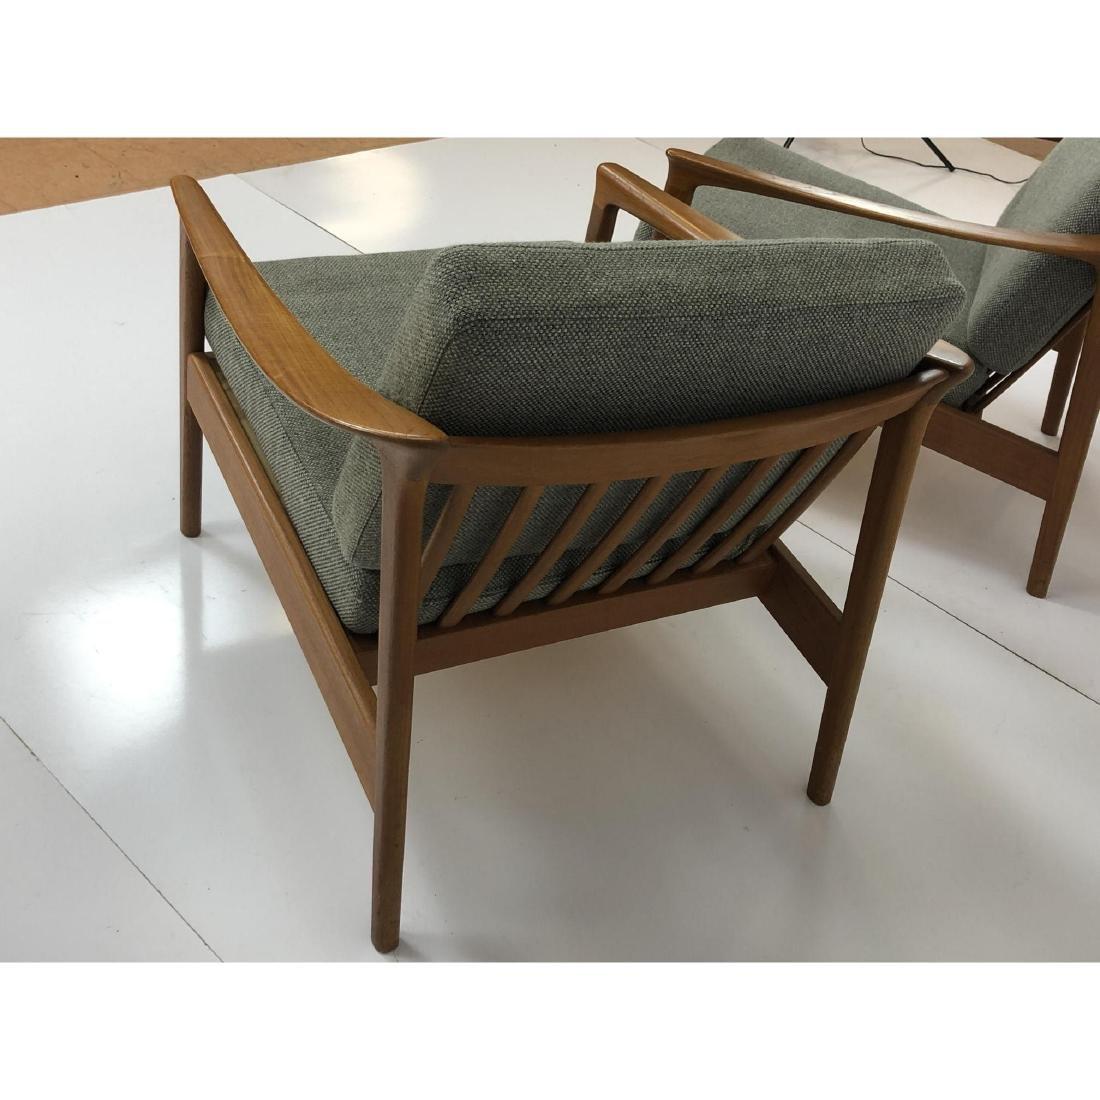 Pr FOLKE OHLSSON Danish Modern Teak Lounge Chairs - 6